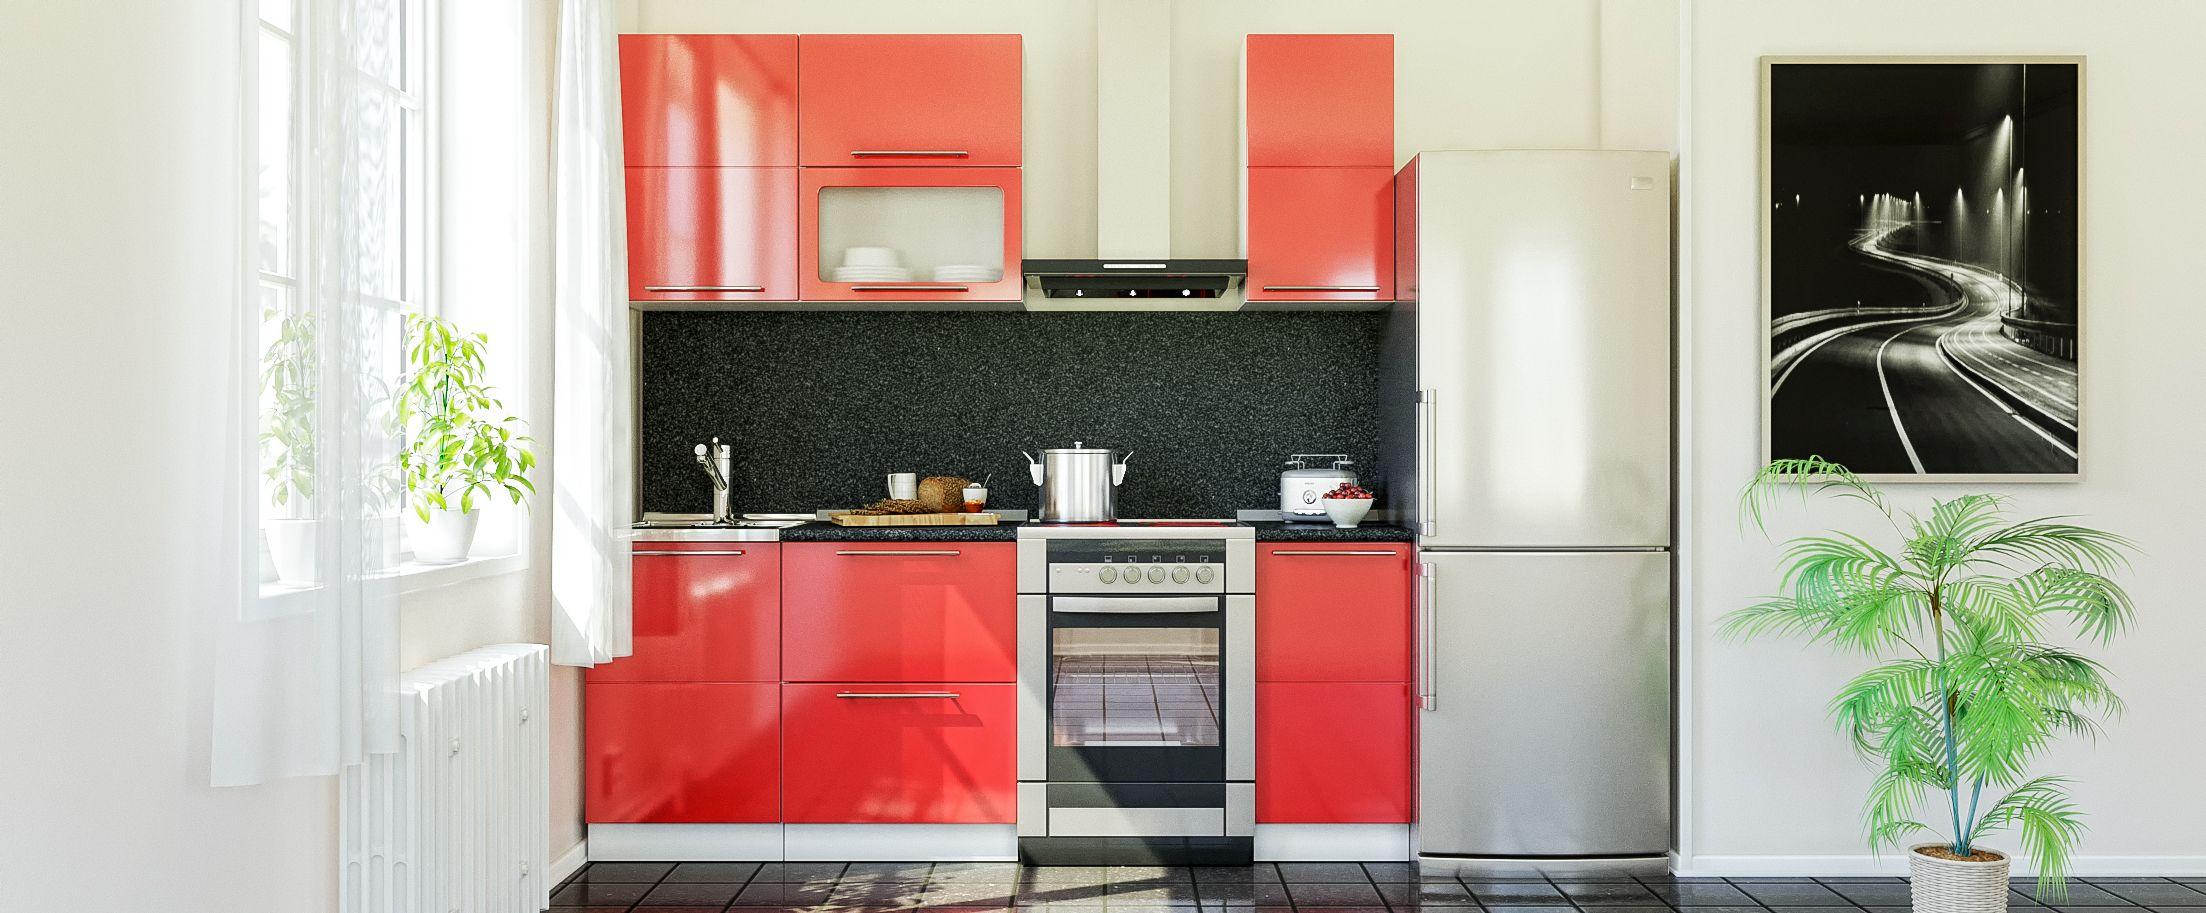 Кухня Красный глянец 1,5 м от MOON TRADE